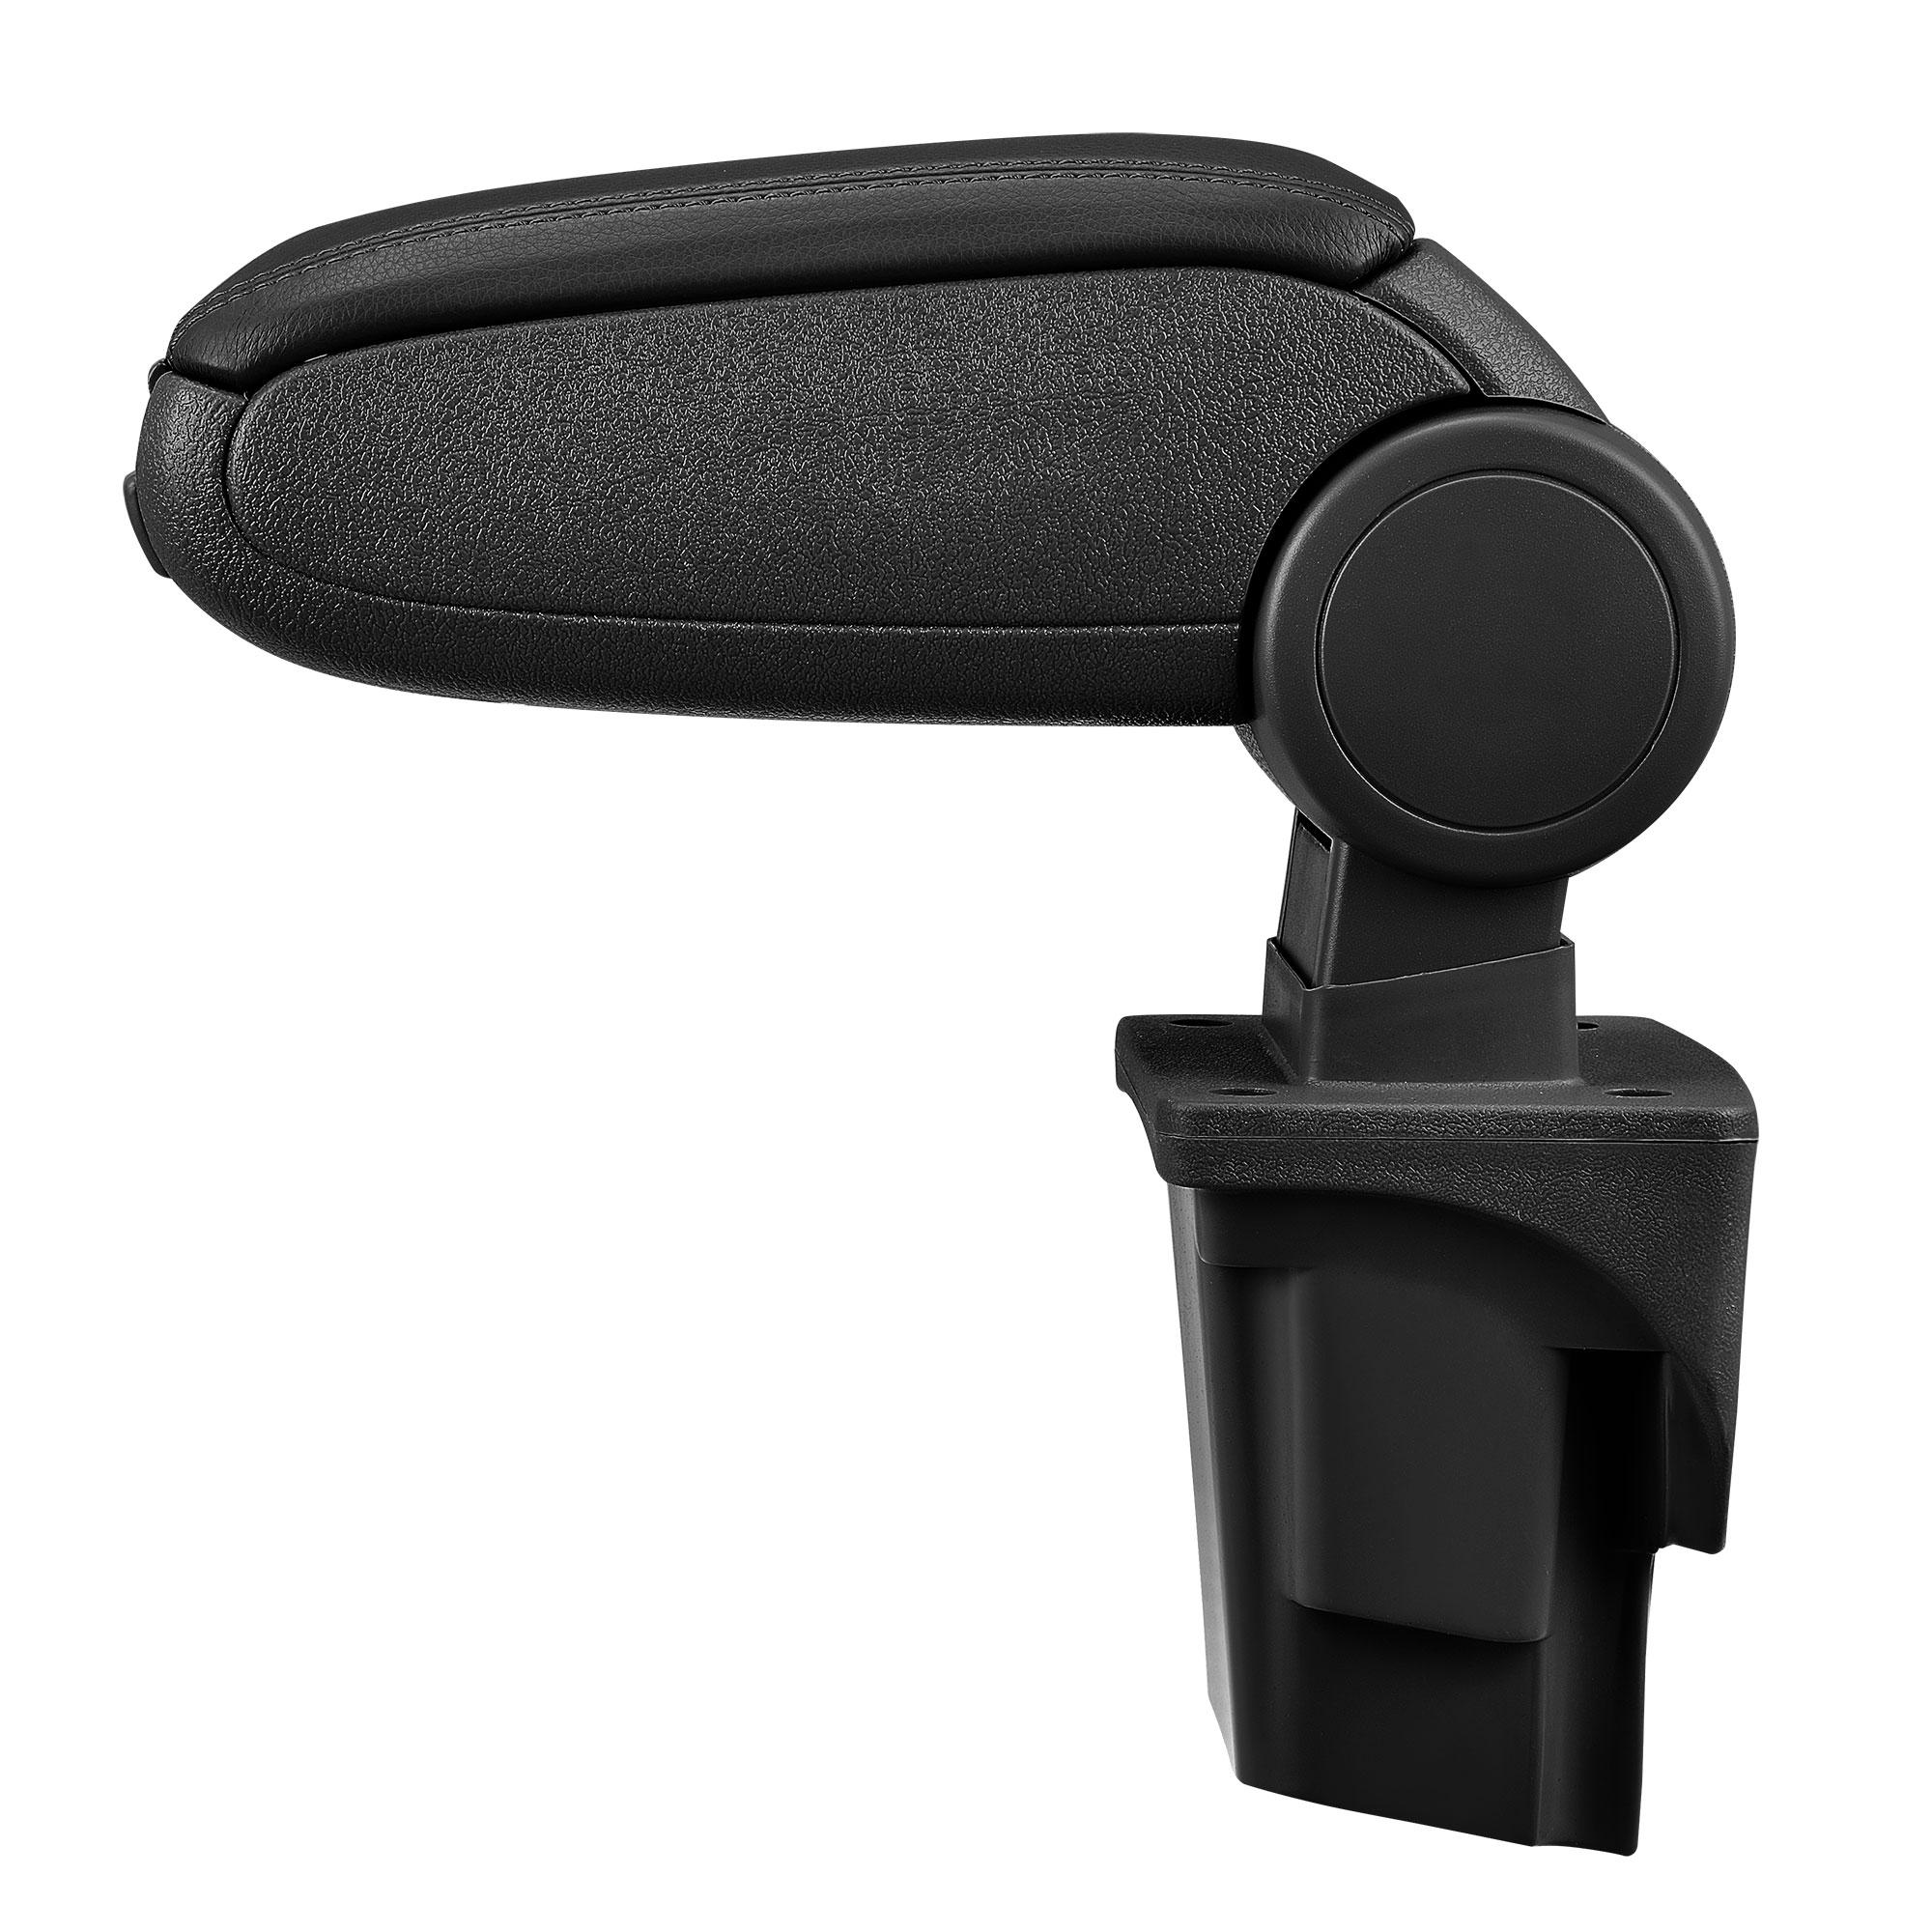 accoudoir neuf seat leon 2 ii type 1p 2005 2009 cuir noir eur 44 90 picclick fr. Black Bedroom Furniture Sets. Home Design Ideas